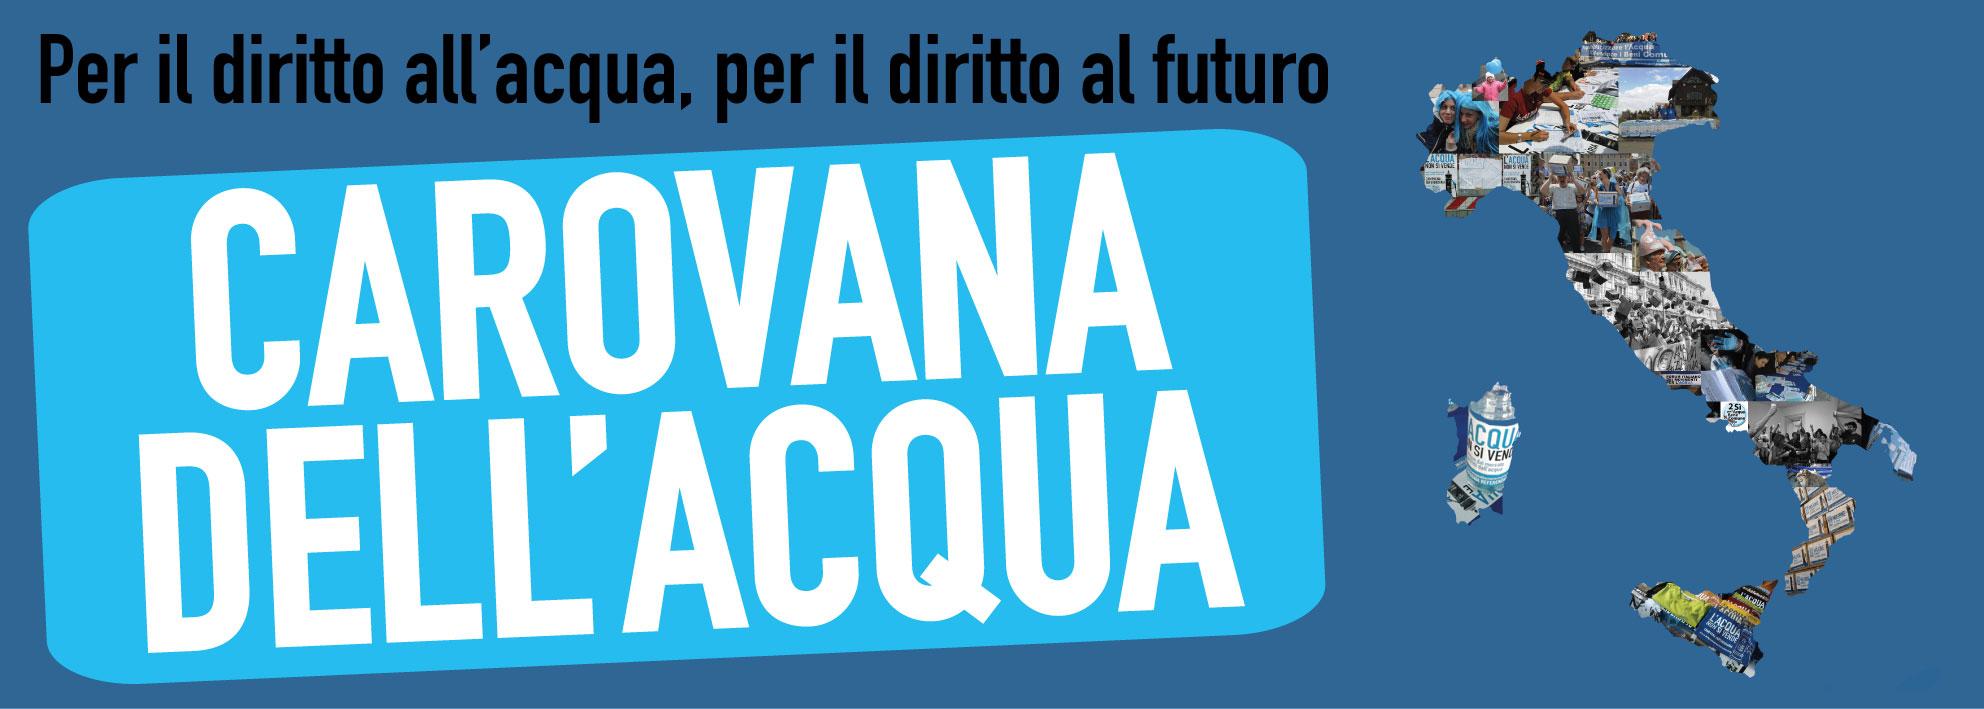 Banner carovana acqua 2018